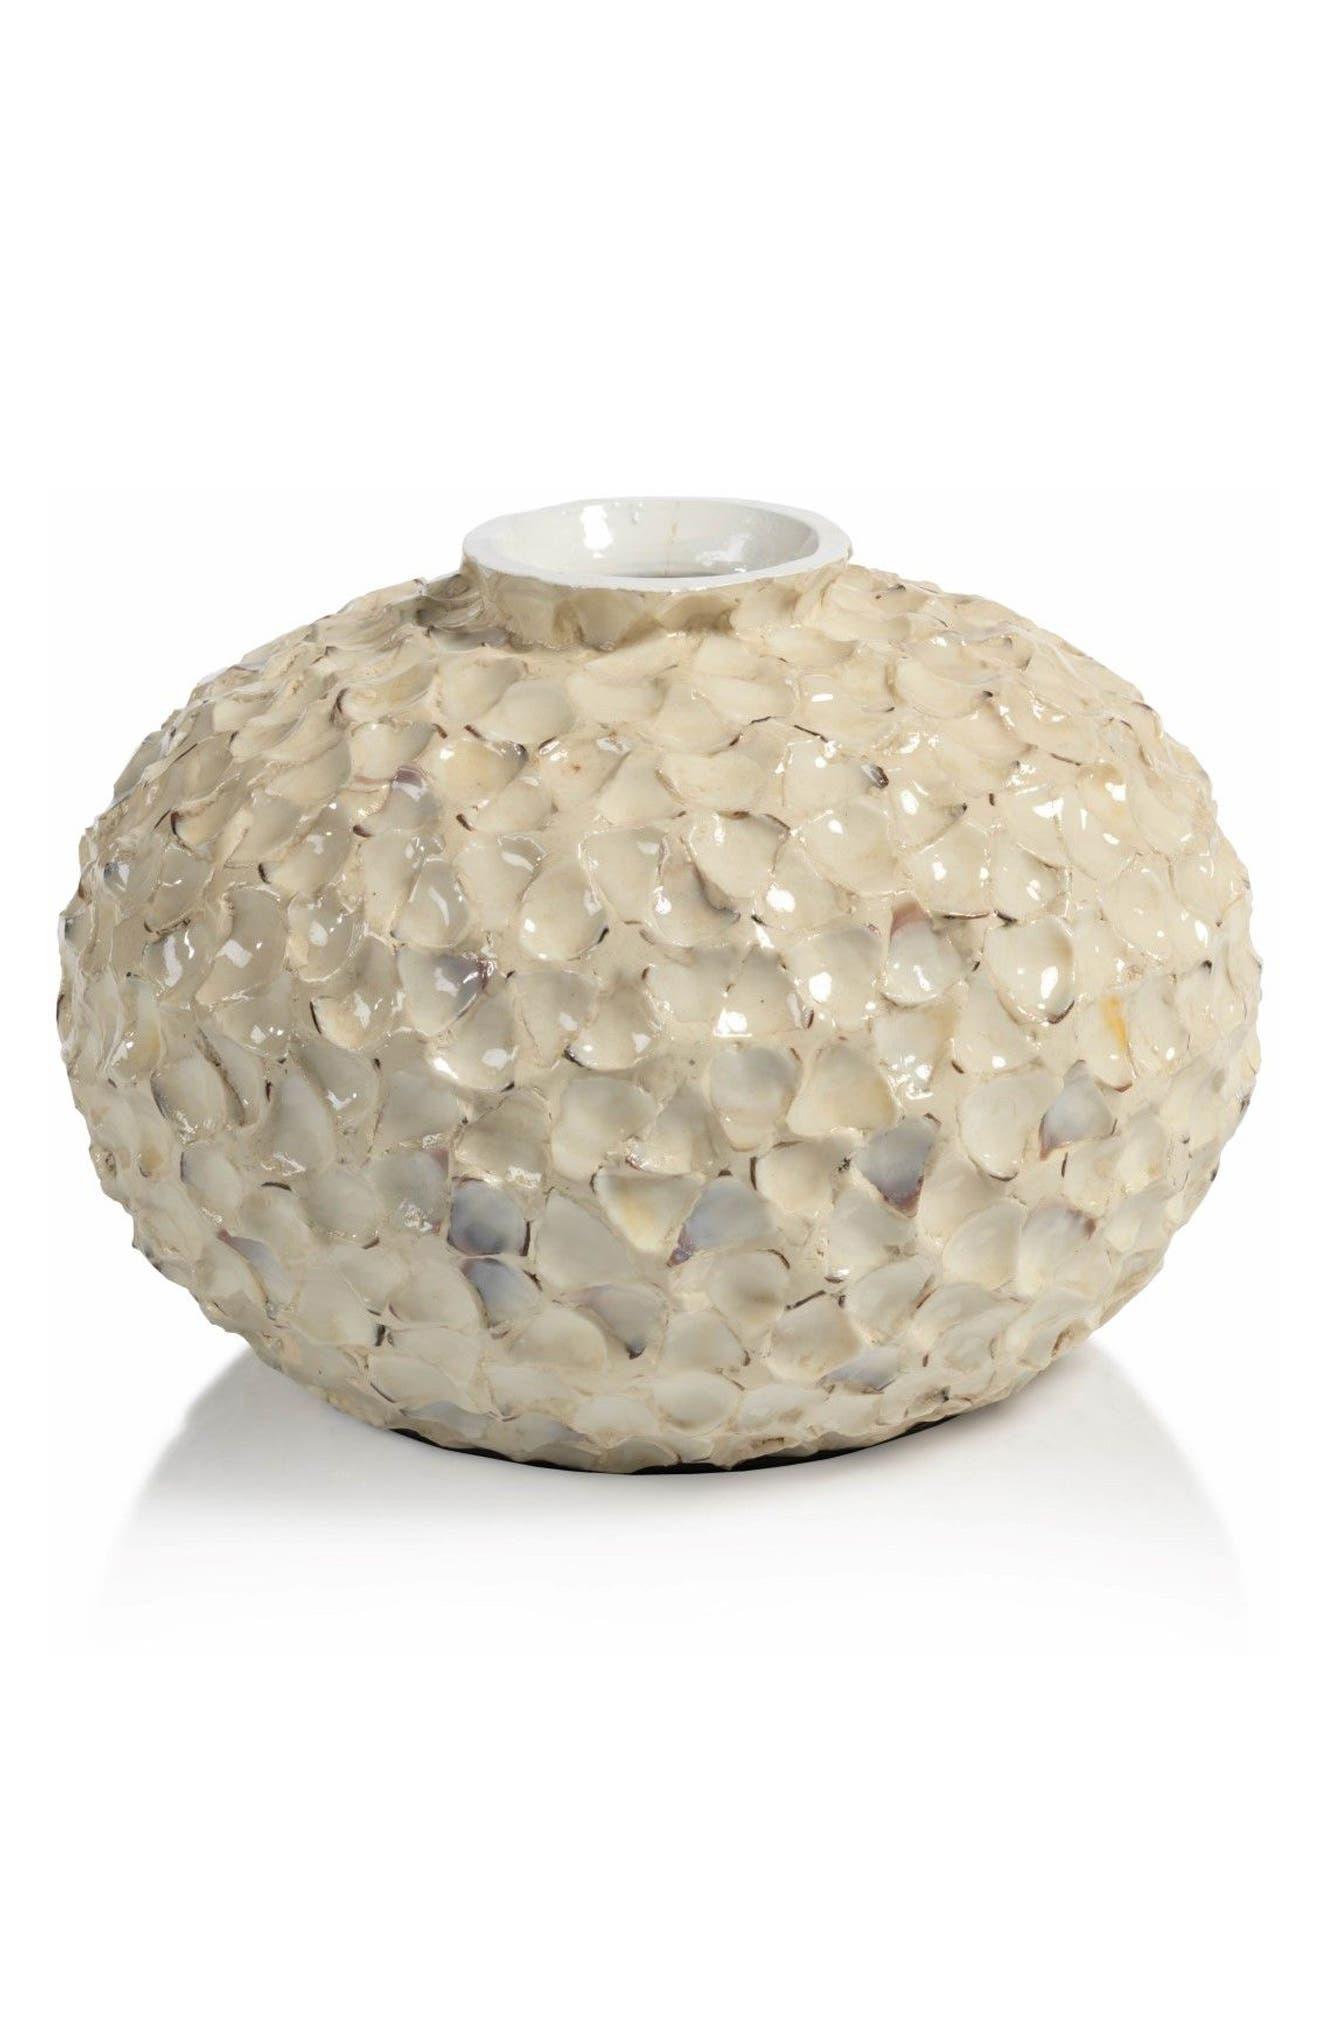 Crozet Ceramic Vase,                             Main thumbnail 1, color,                             250